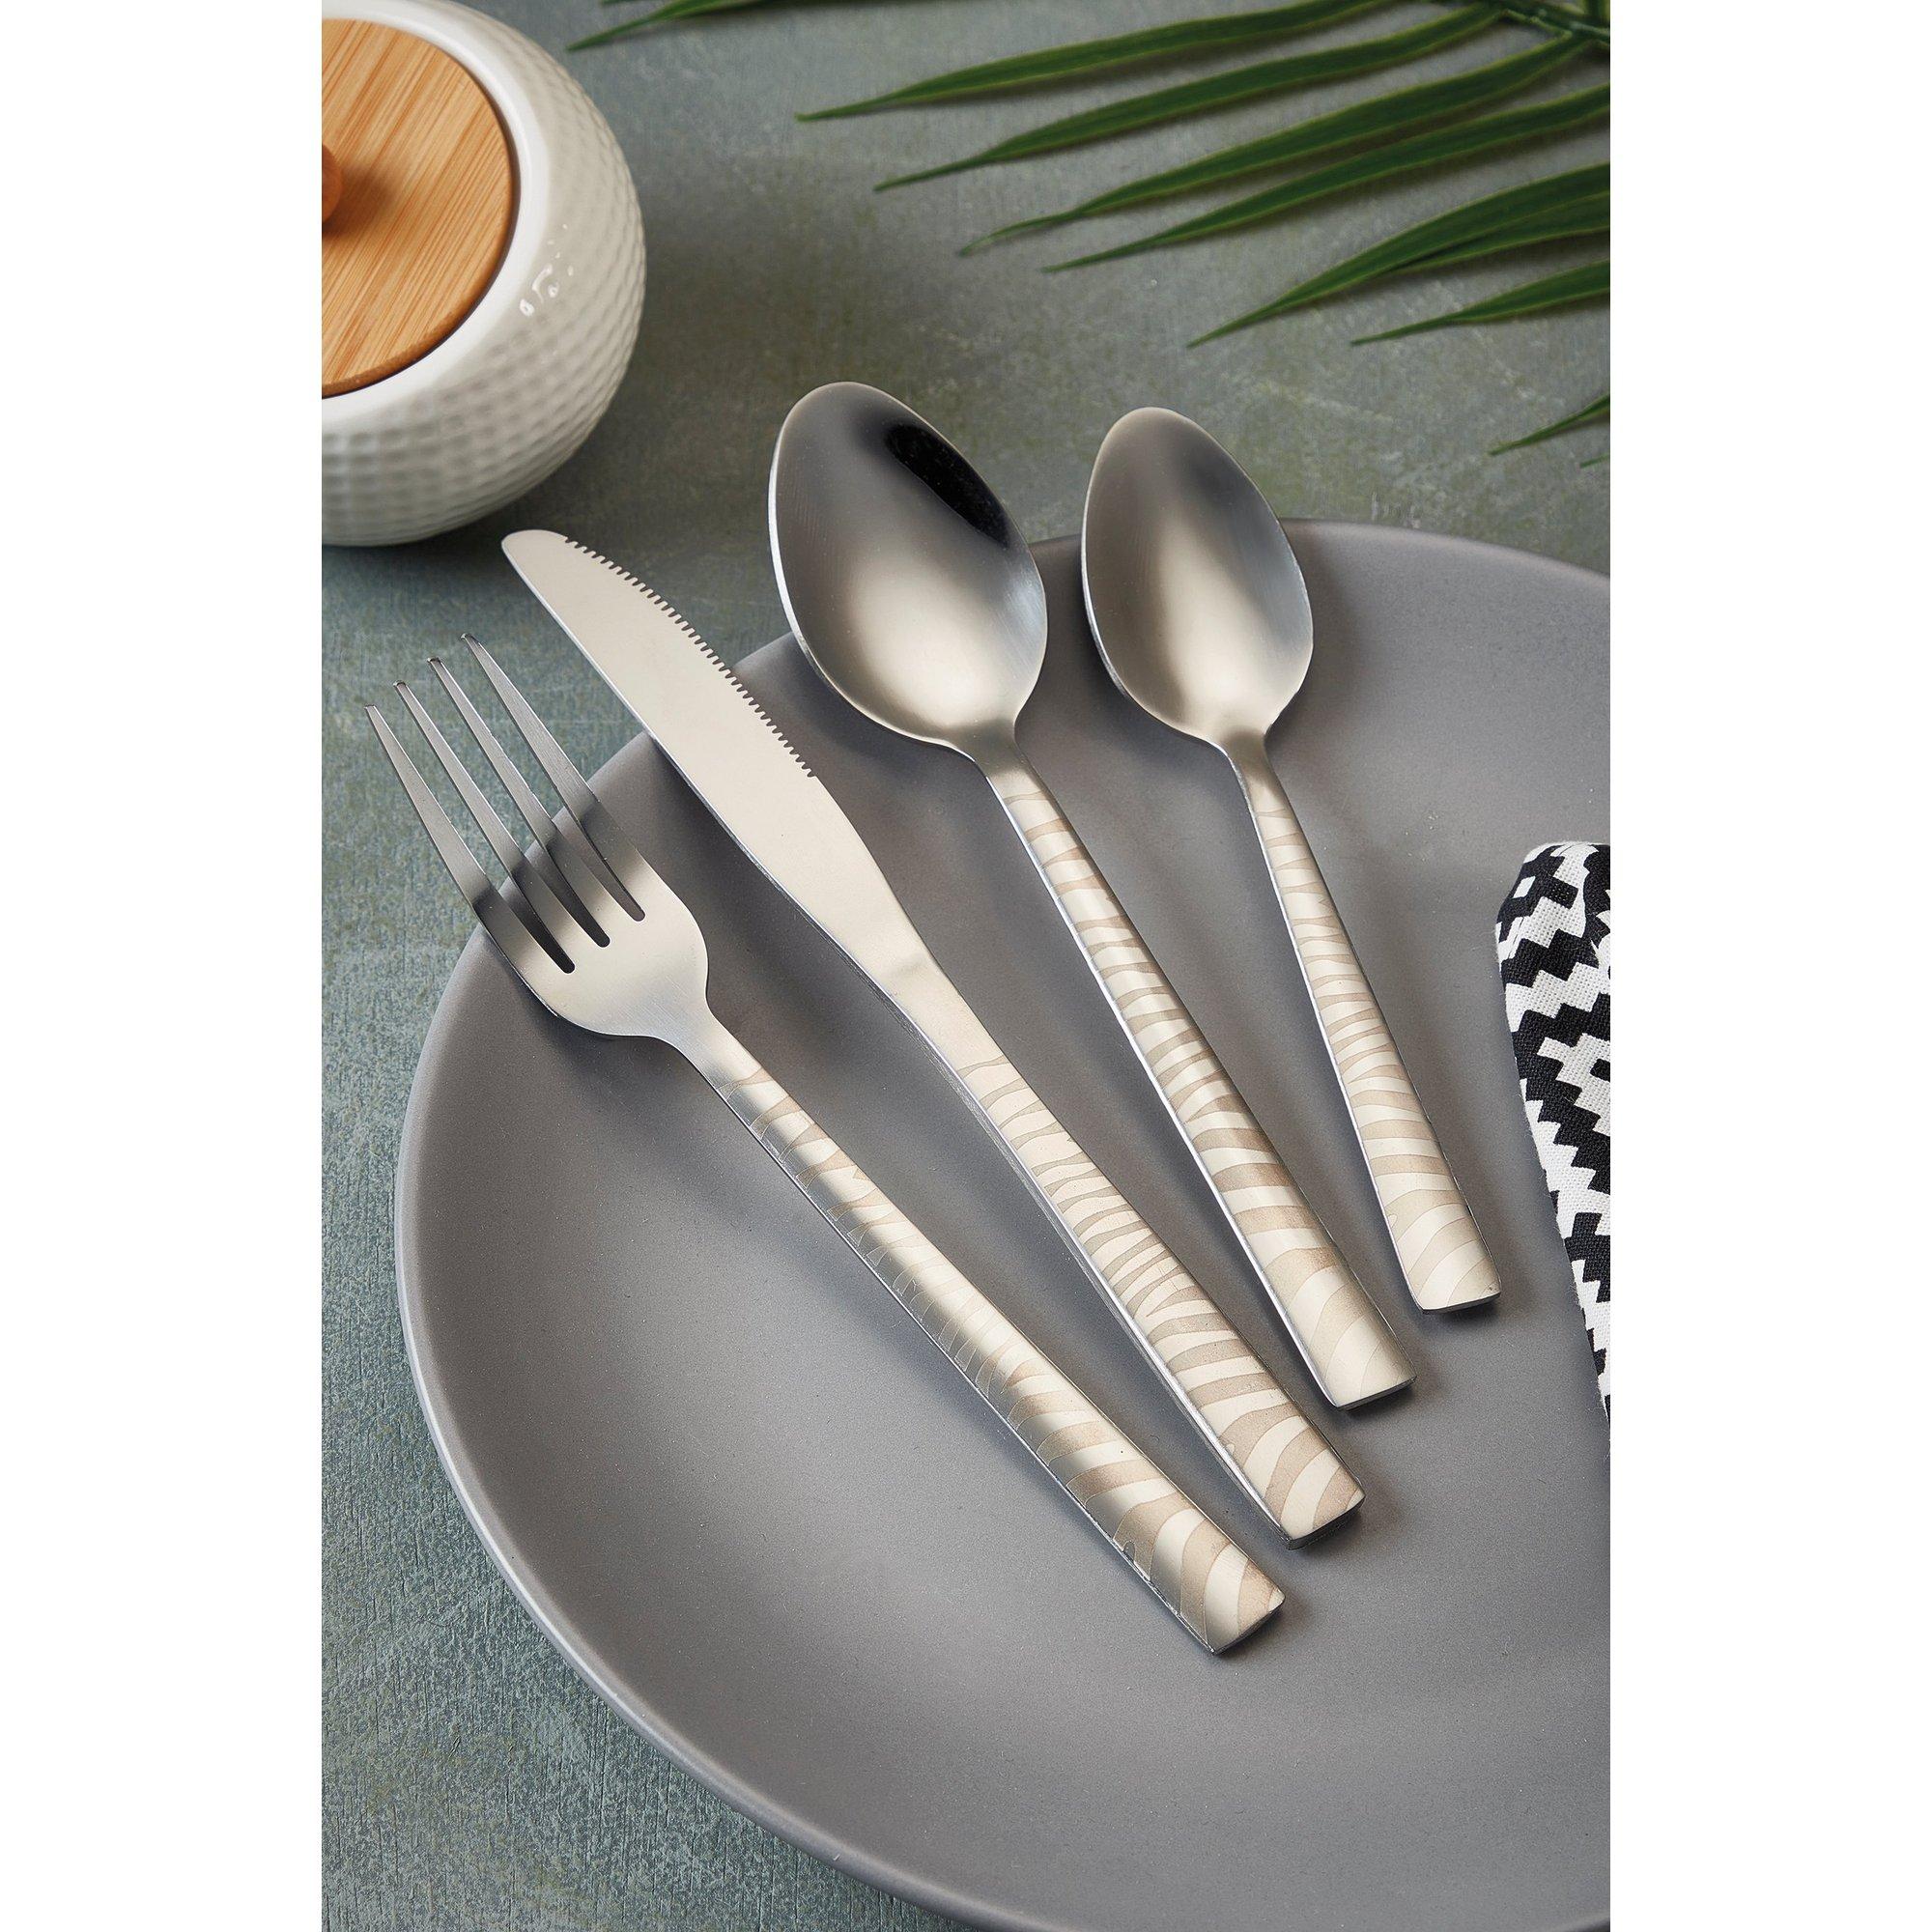 Image of 16-Piece Zebra Cutlery Set